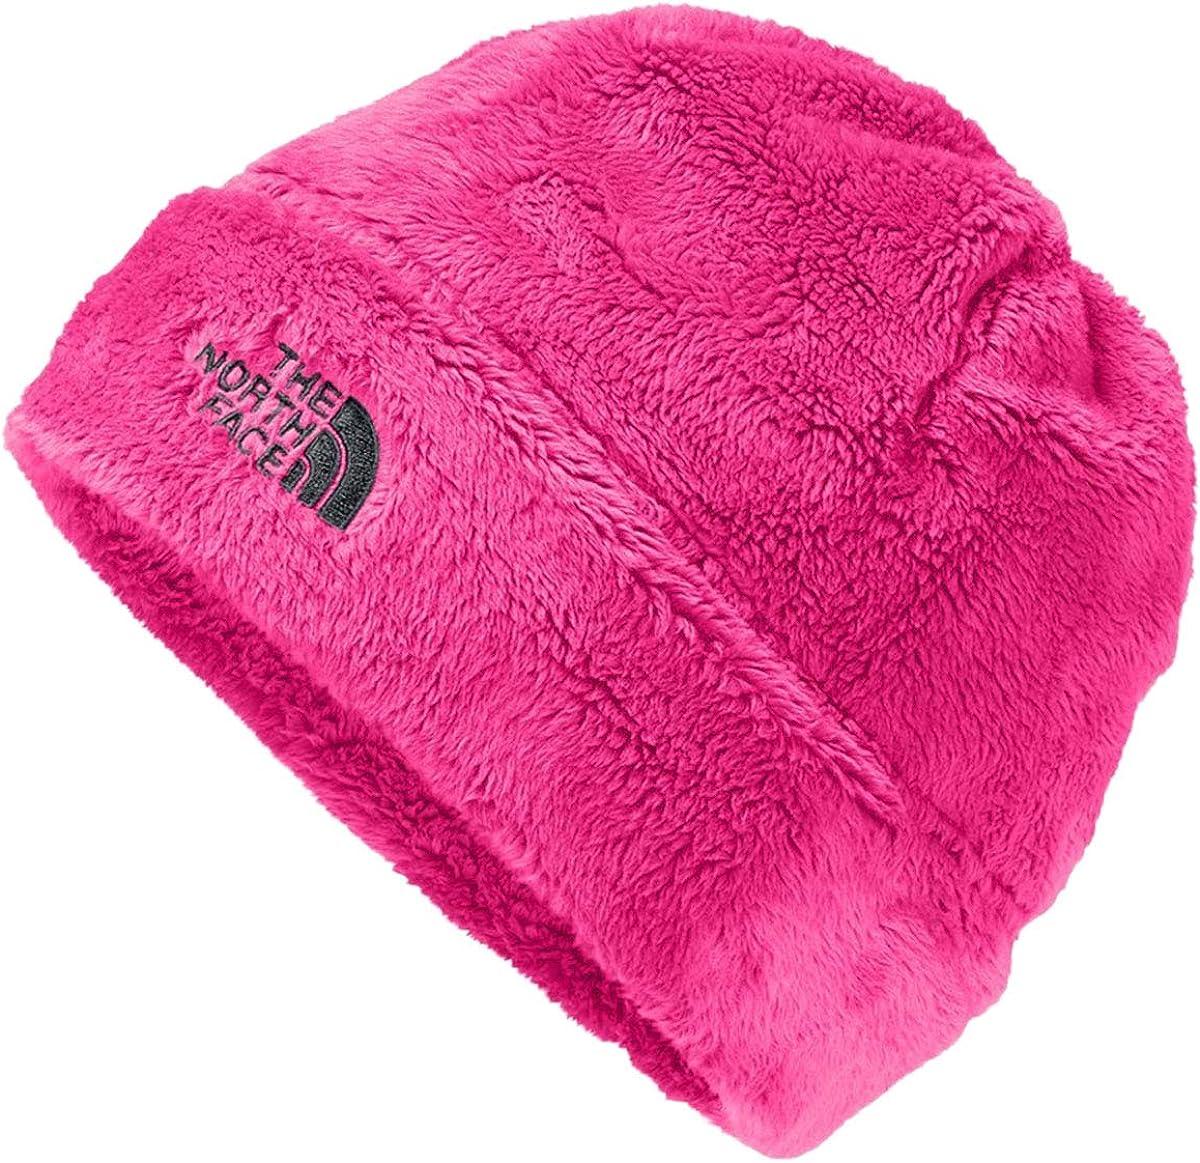 The North Face Kids Denali Thermal Beanie Big Kids Petticoat Pink//Graphite Grey Beanies